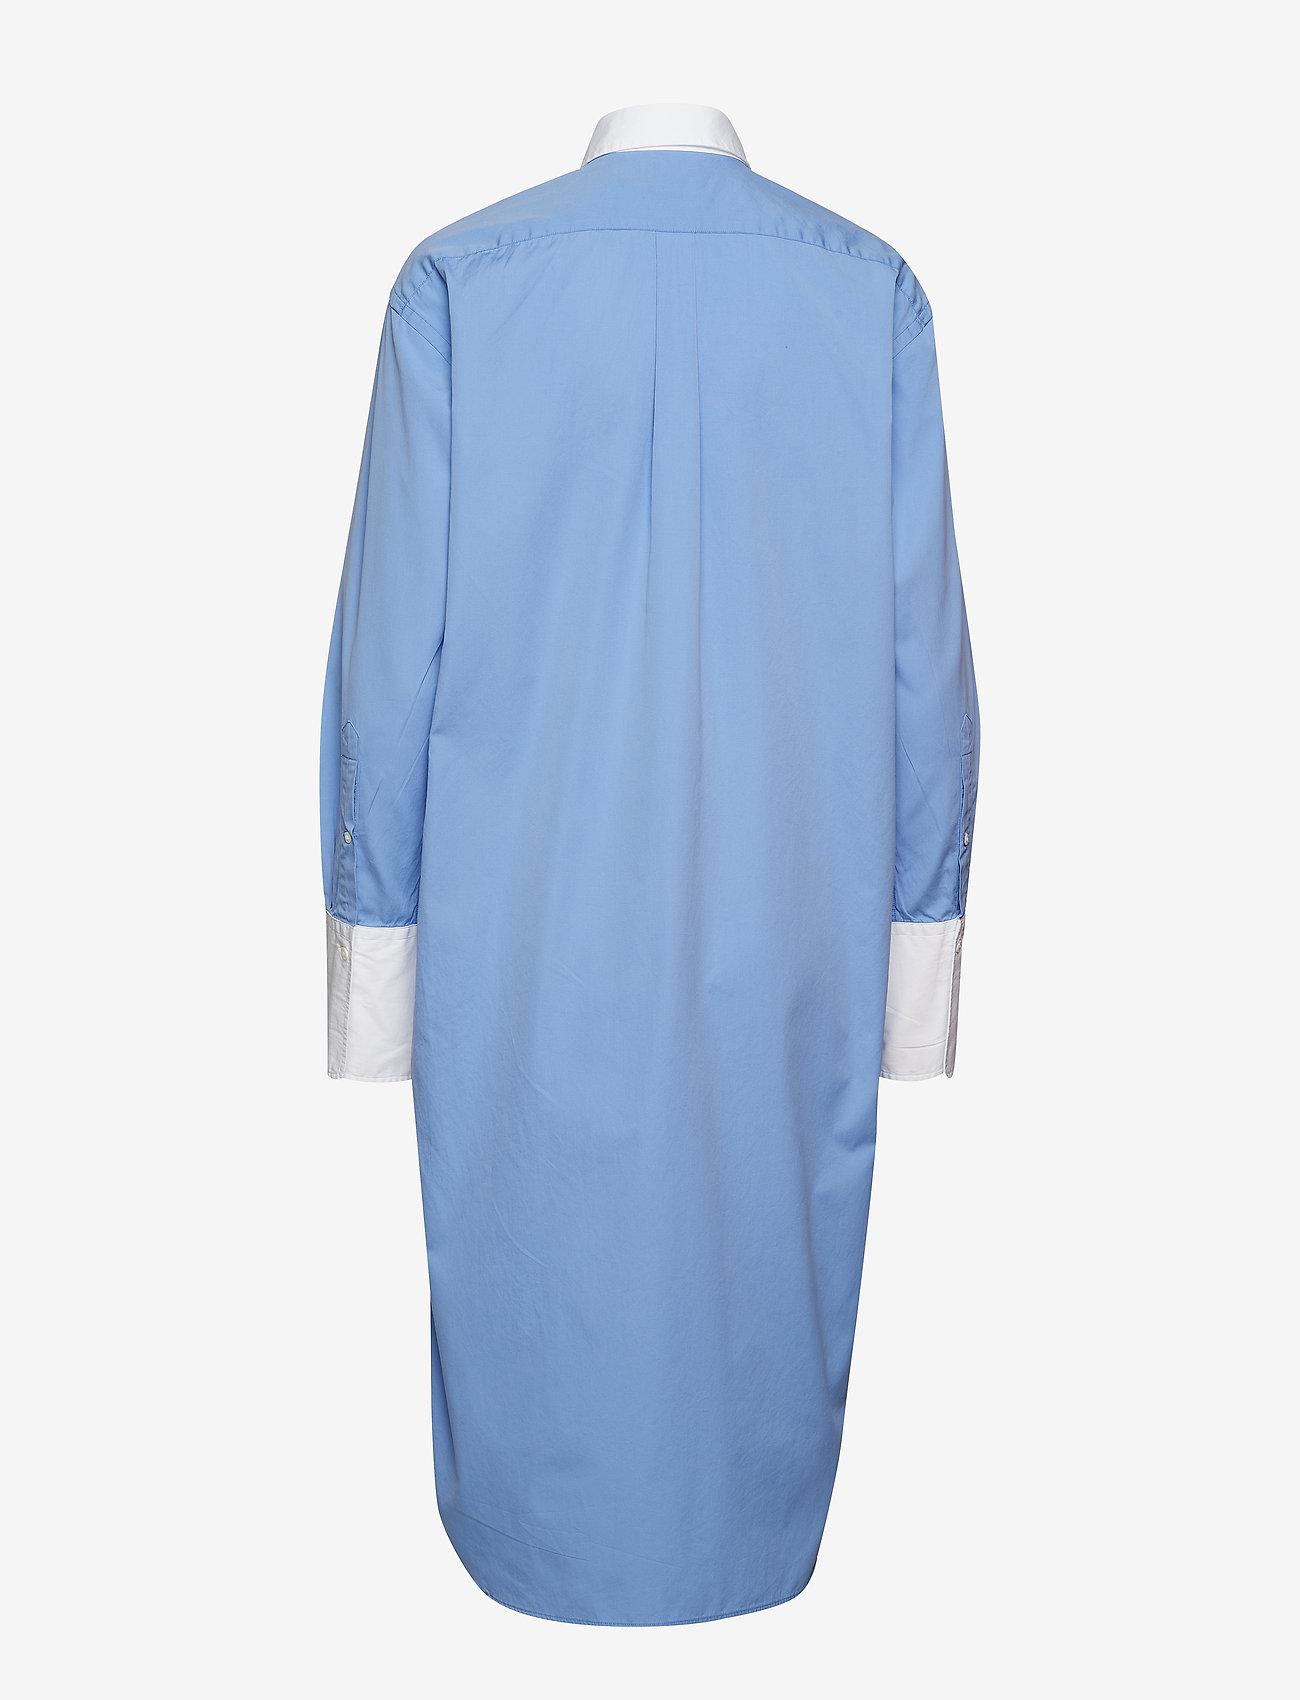 Polo Ralph Lauren Broadcloth-lsl-csd - Dresses